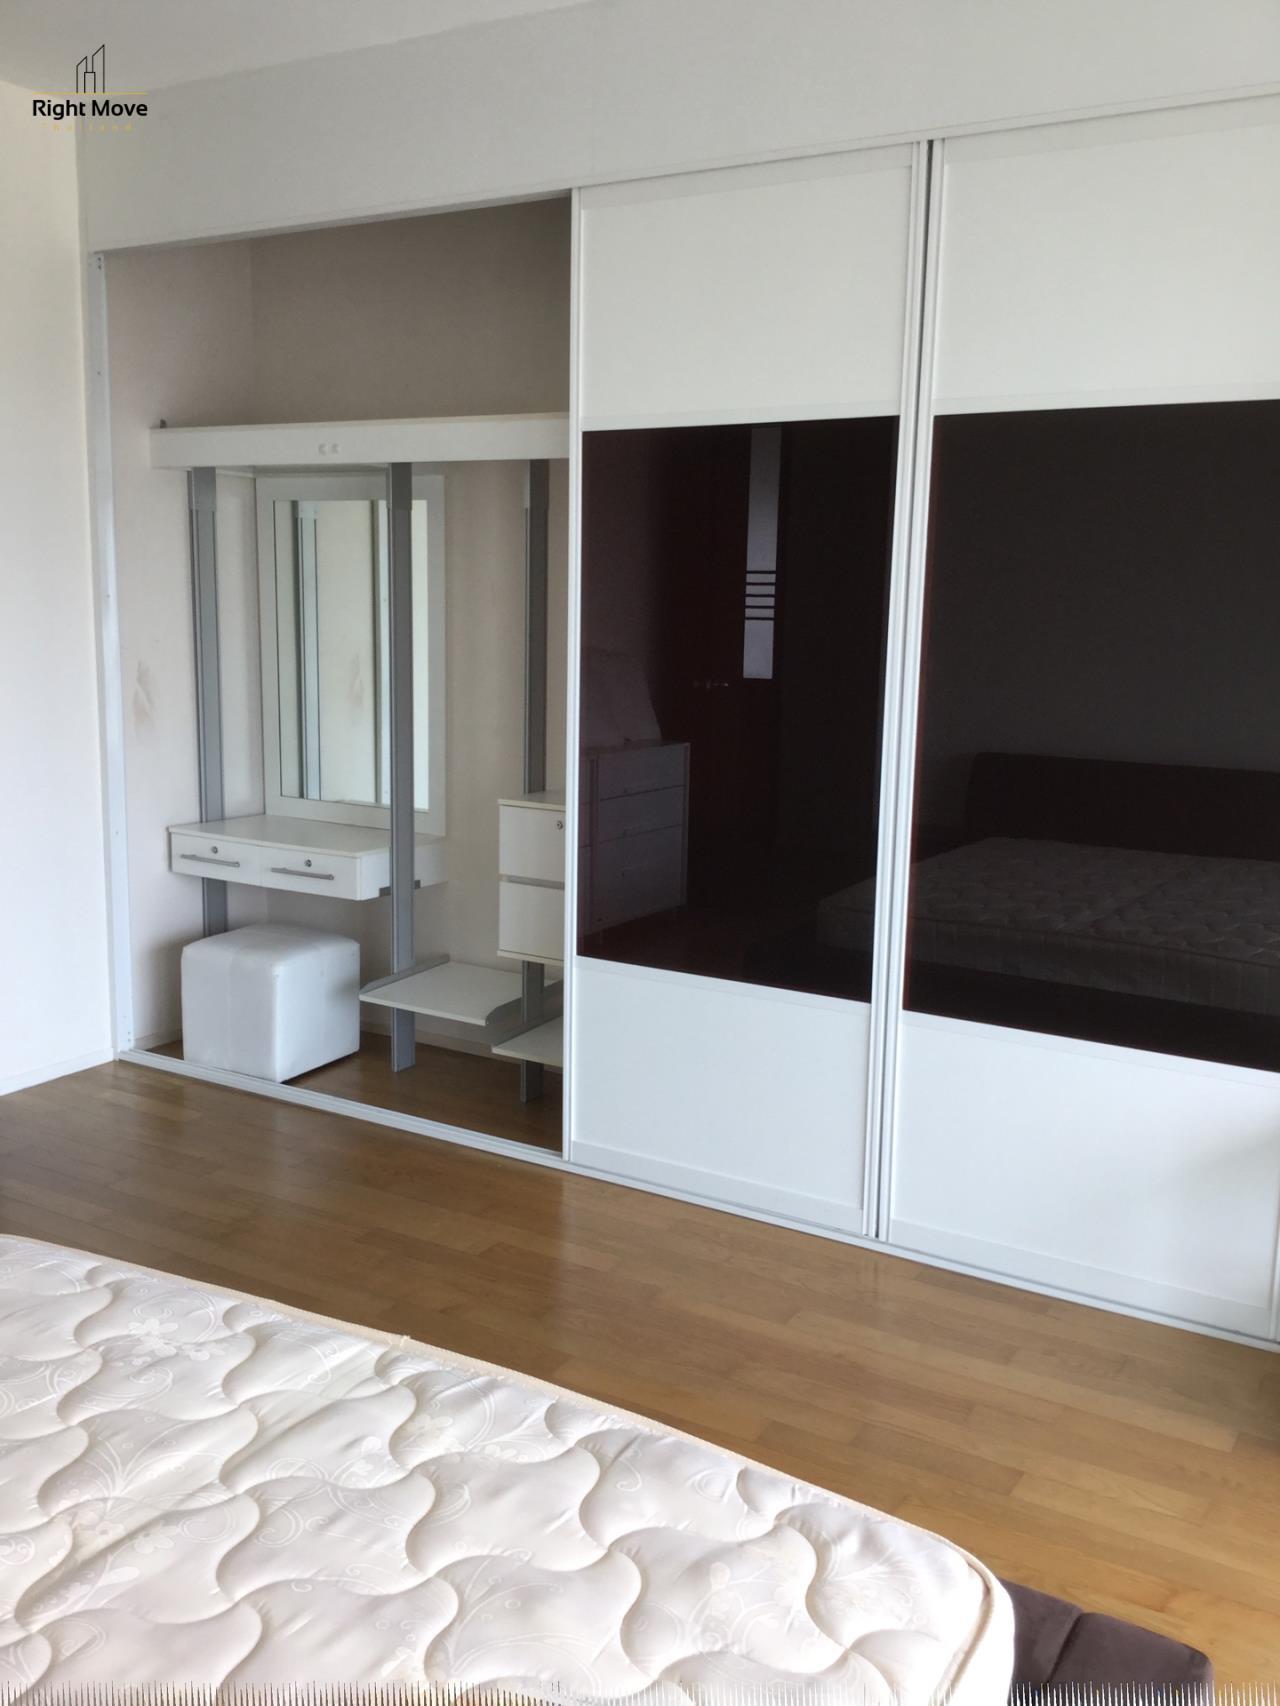 Right Move Thailand Agency's CA5486 Madison Condominium For Rent 90,000 THB - 3 Bedrooms - 160 sqm. 6